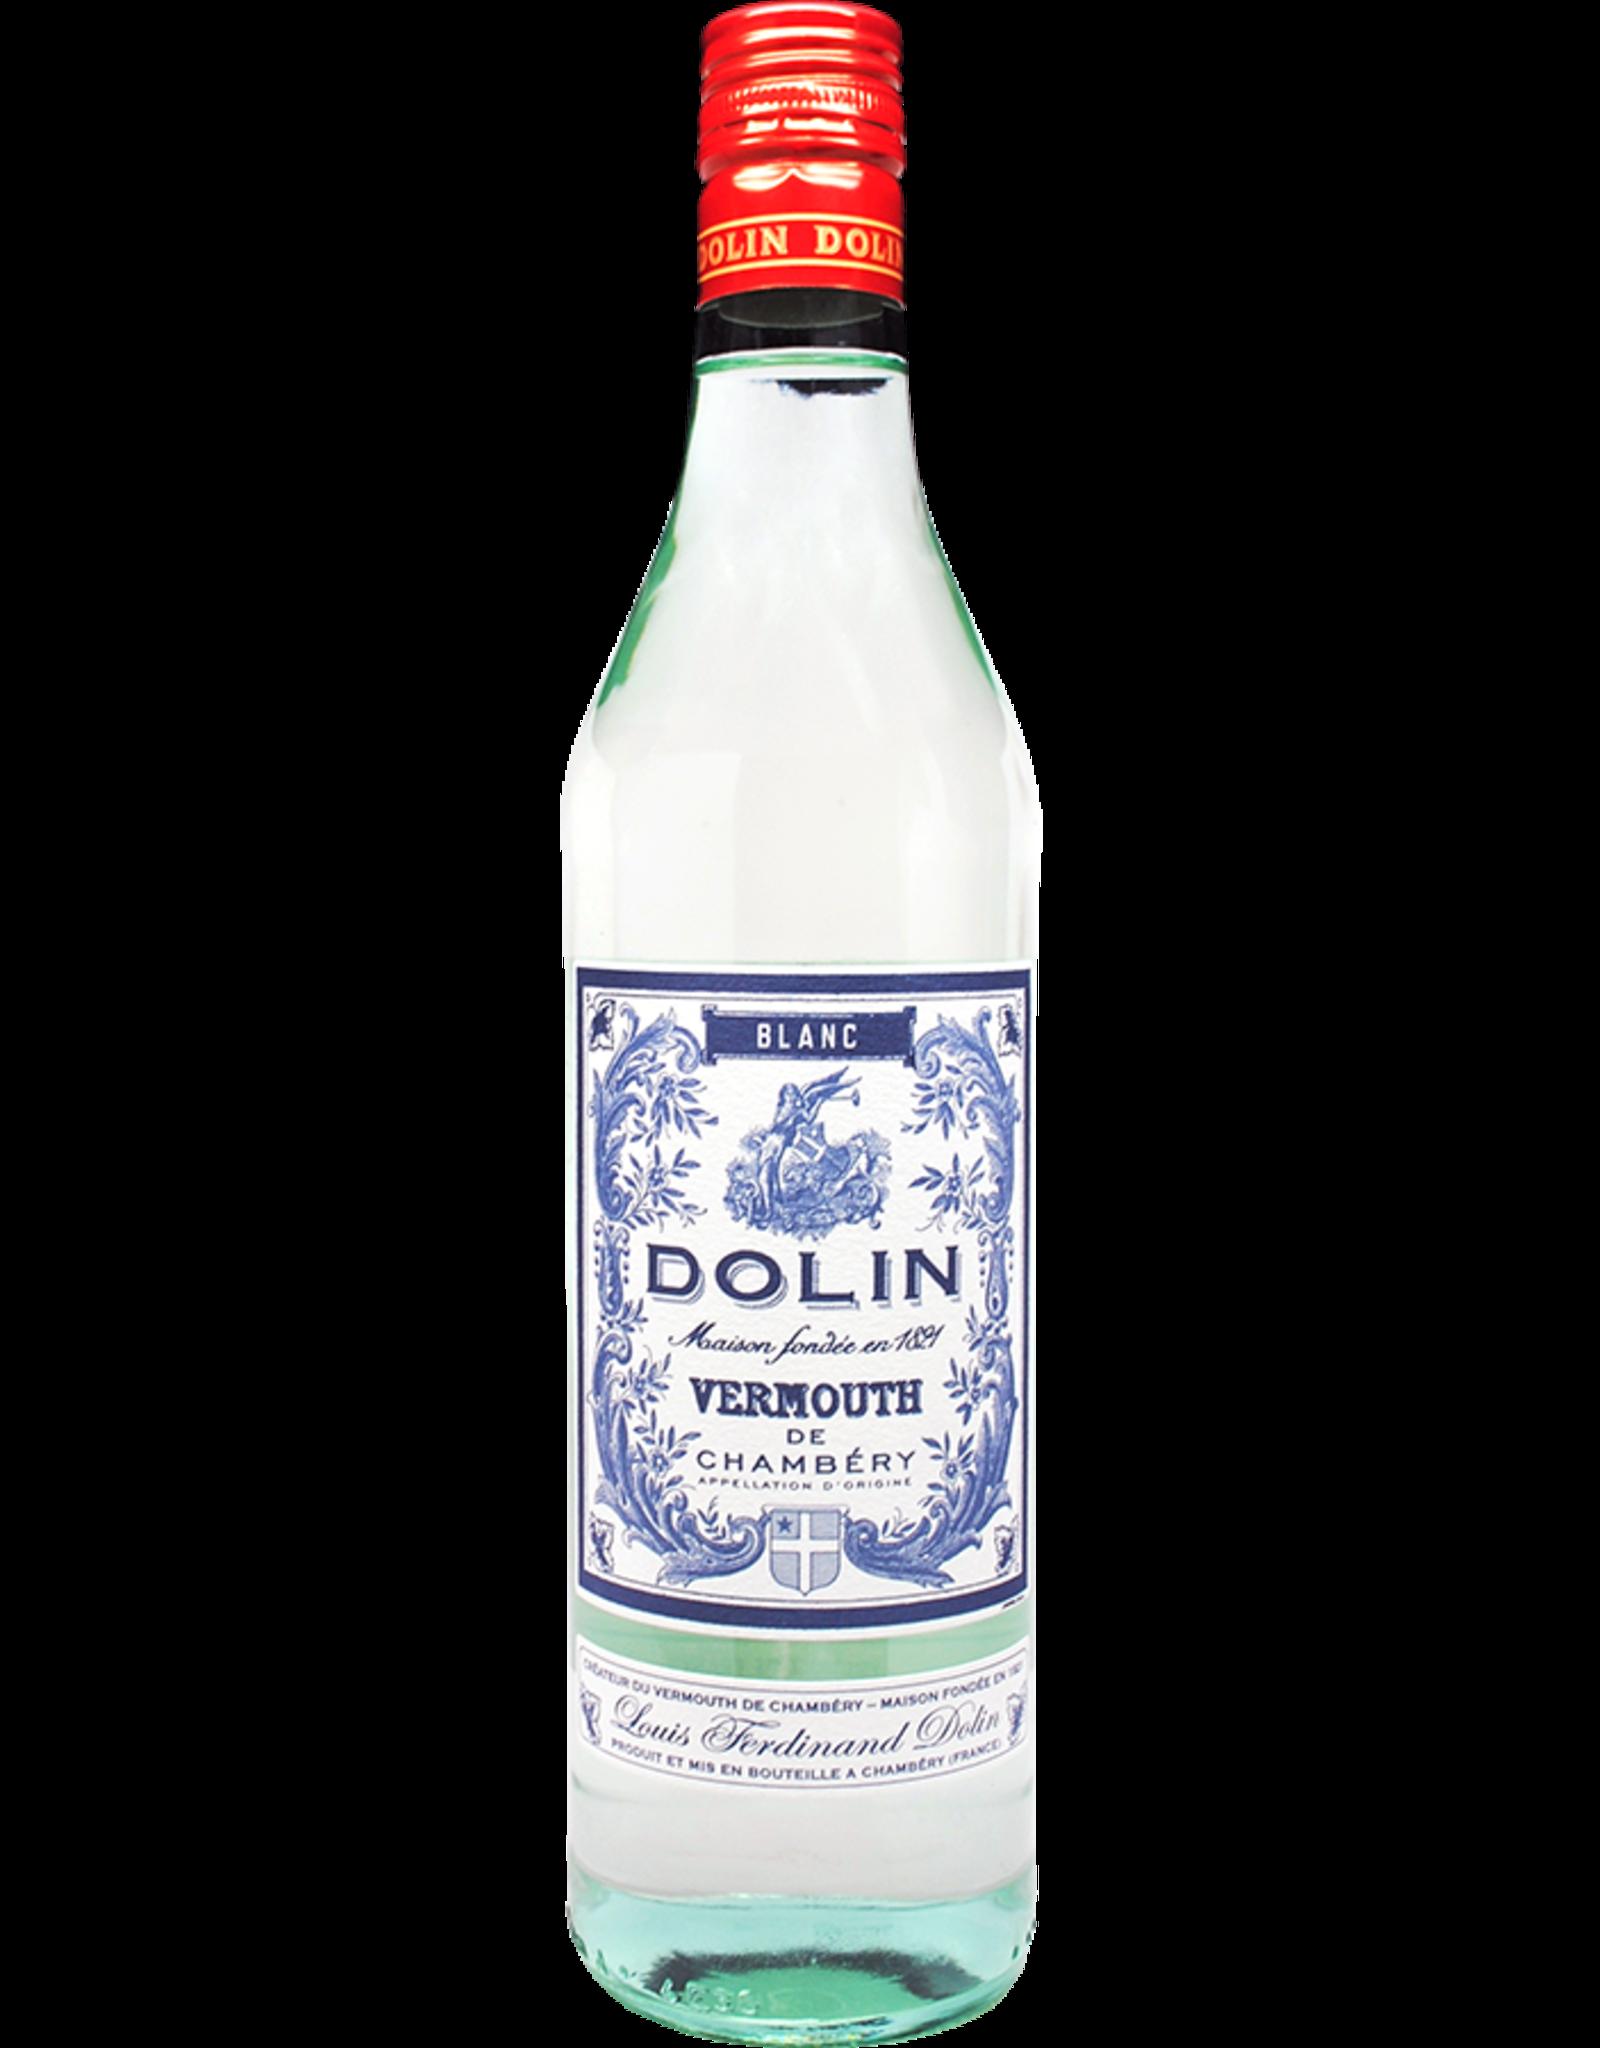 Dolin Dolin Vermouth de Chambery Blanc 750ml